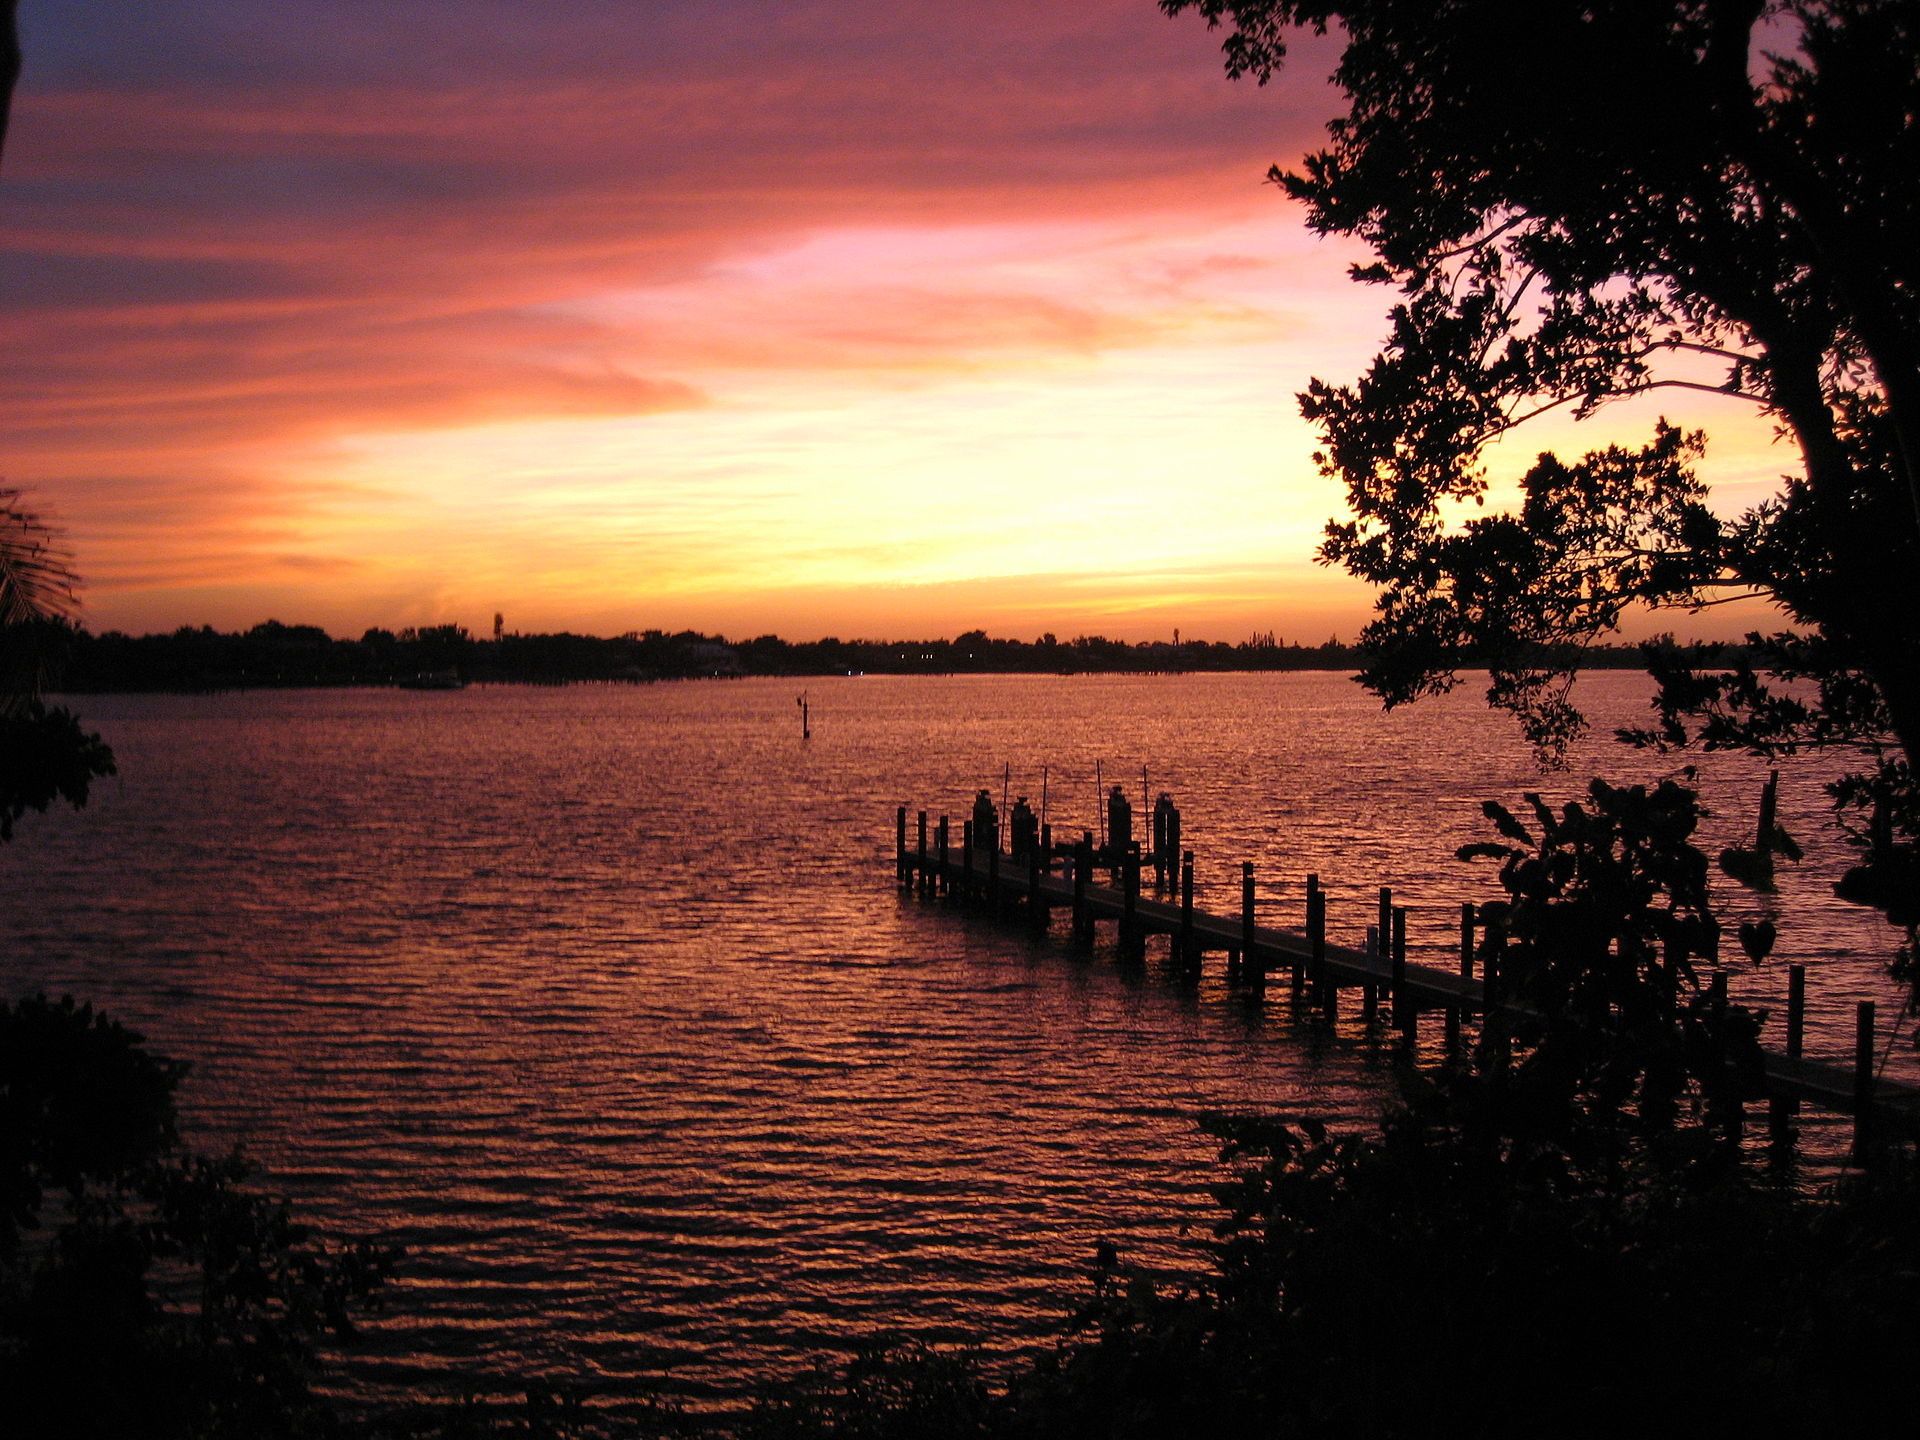 North Florida Island Resorts